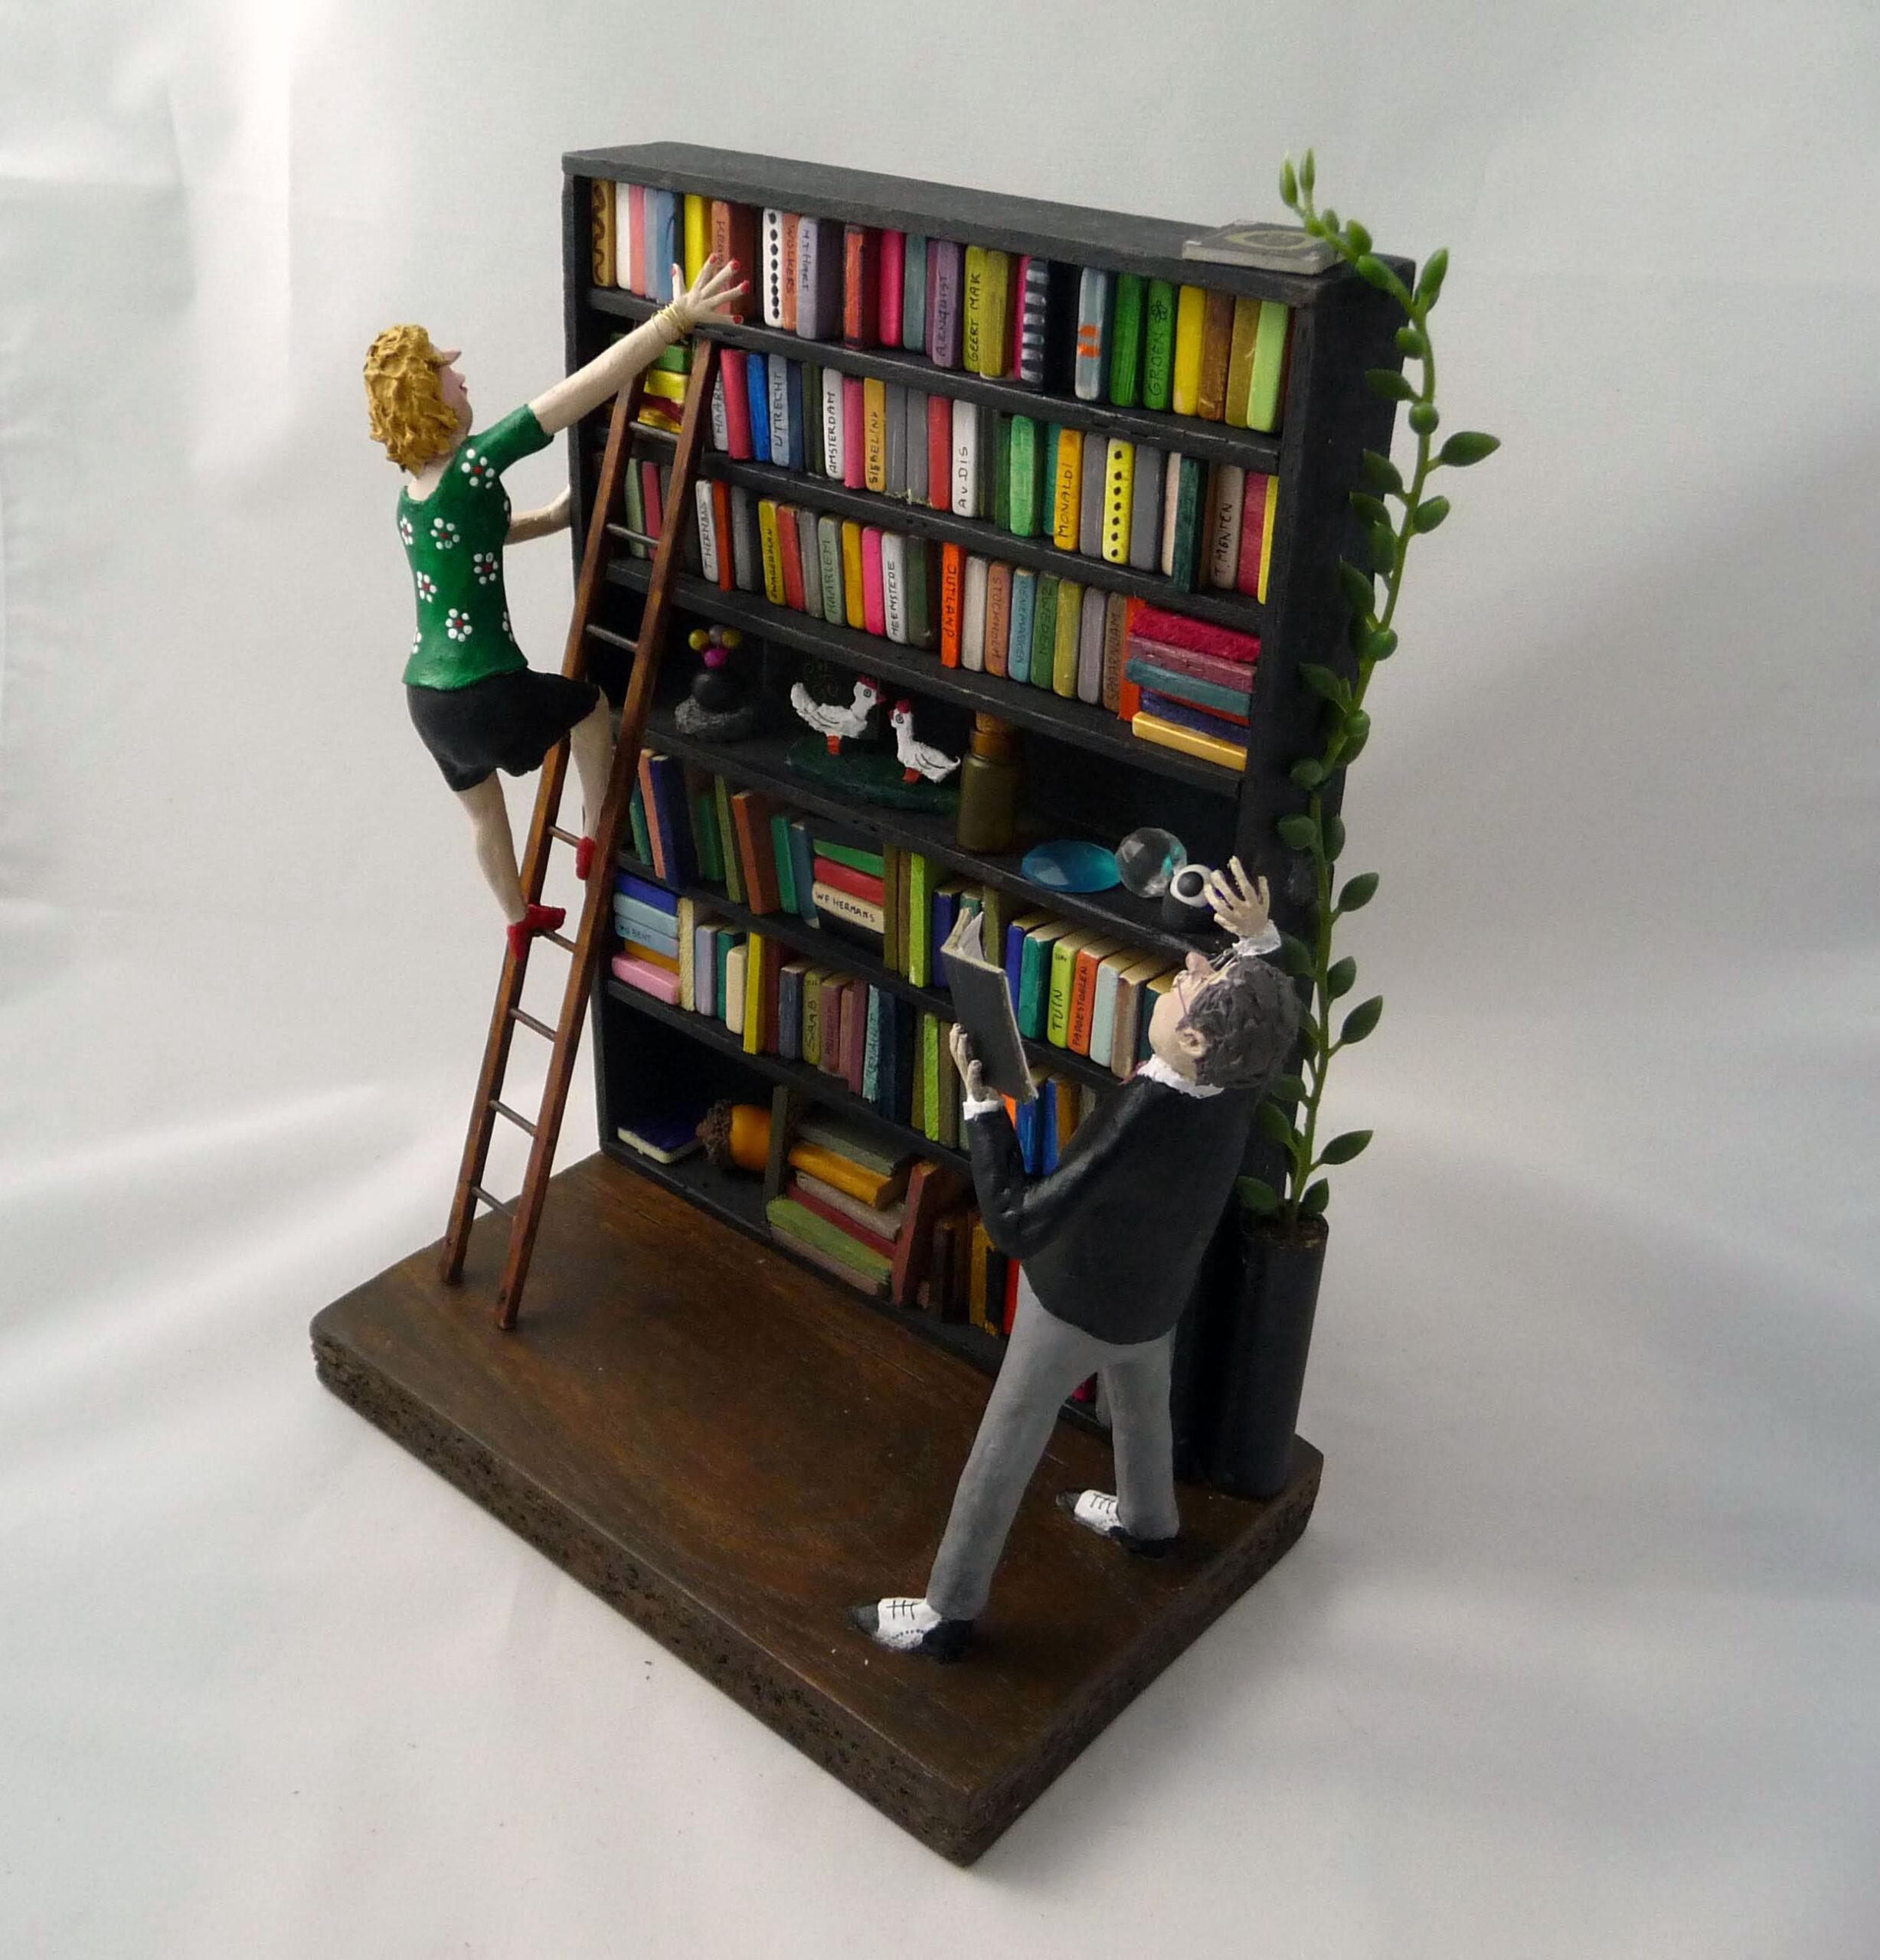 Ja dat boek